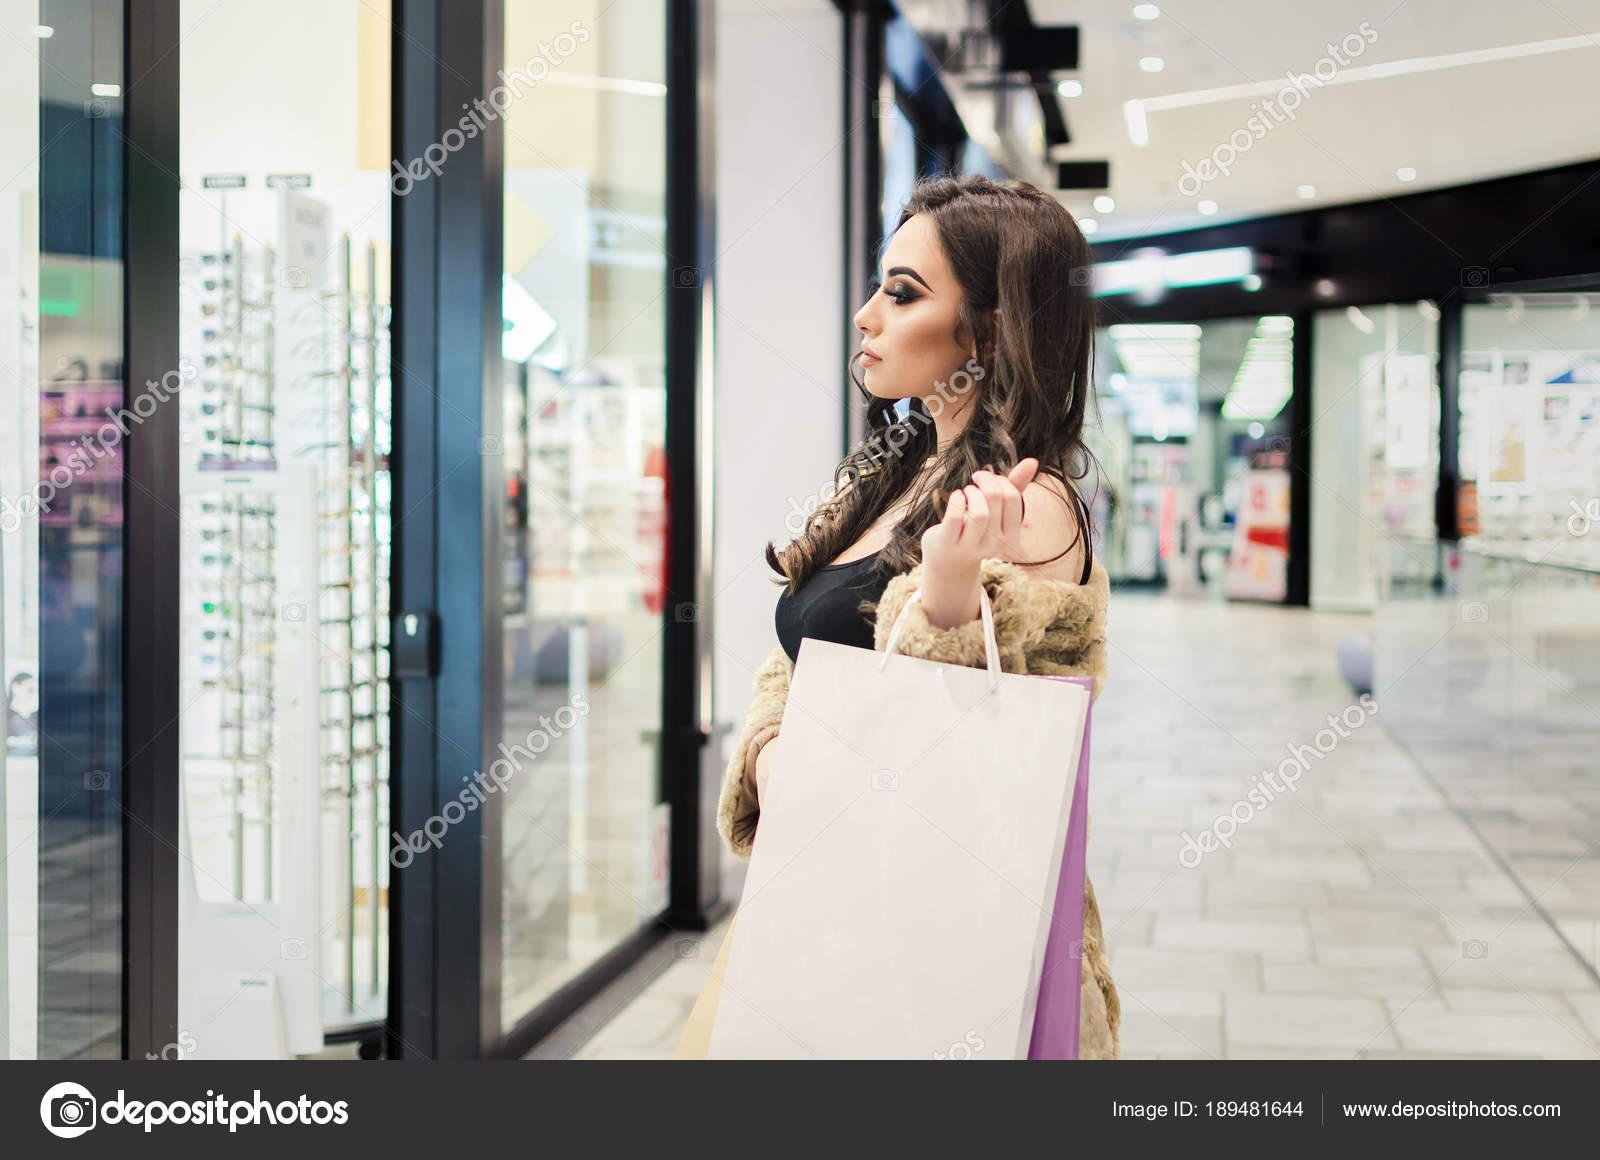 b037e2246f Σταθείτε Γυαλιά Στο Κατάστημα Οπτικών Μάτια Της Γυναίκας Επιλέγει Γυαλιά — Φωτογραφία  Αρχείου